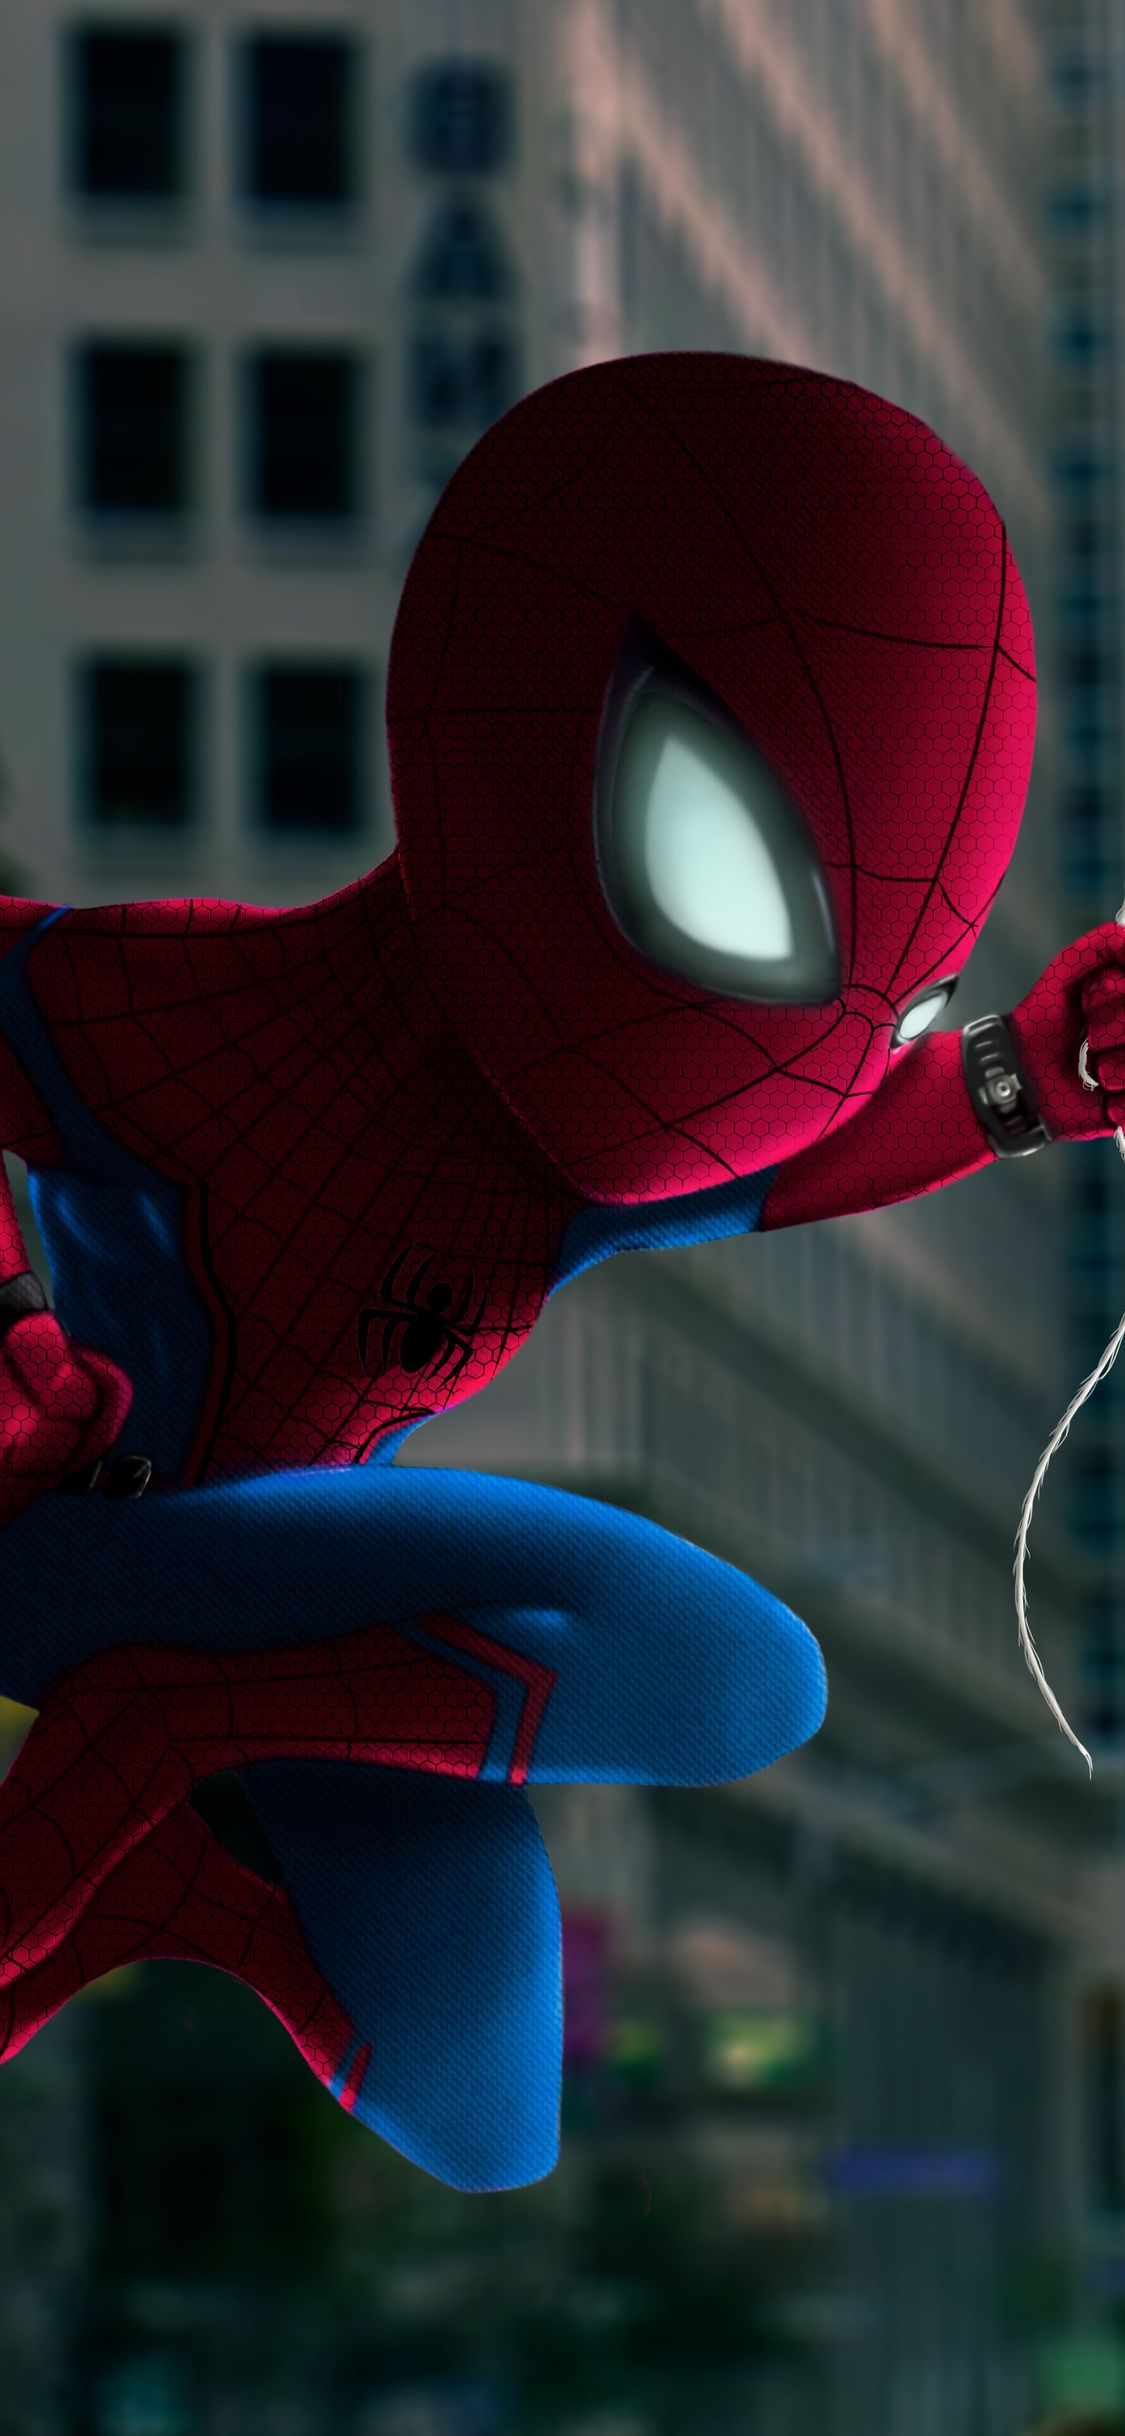 Spiderman Closeup Art Iphone X Spiderman Man Wallpaper Live